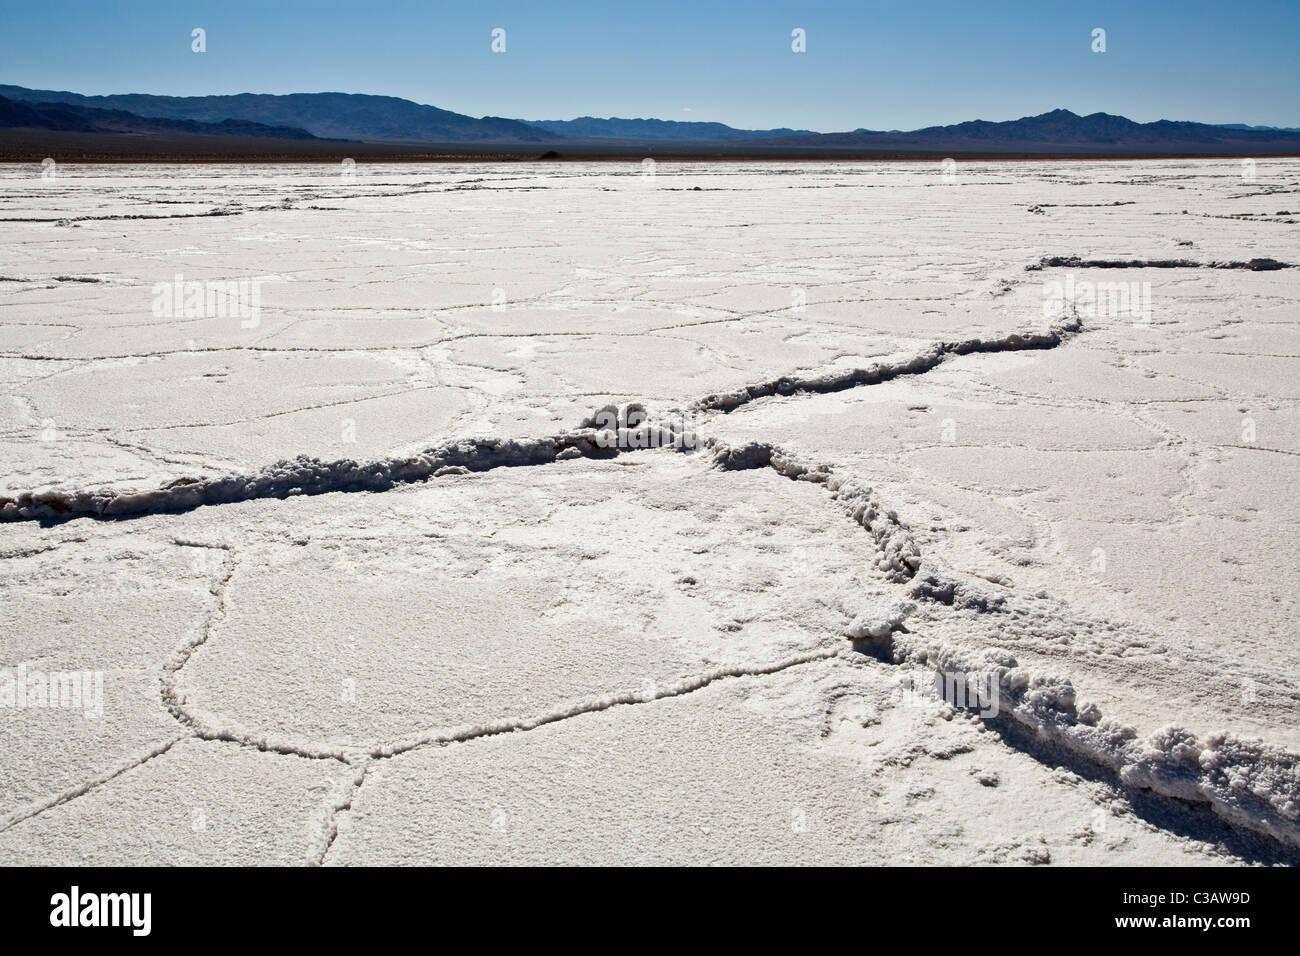 Bristol Lake (Dry Lake Bed) California, United States of America - Stock Image